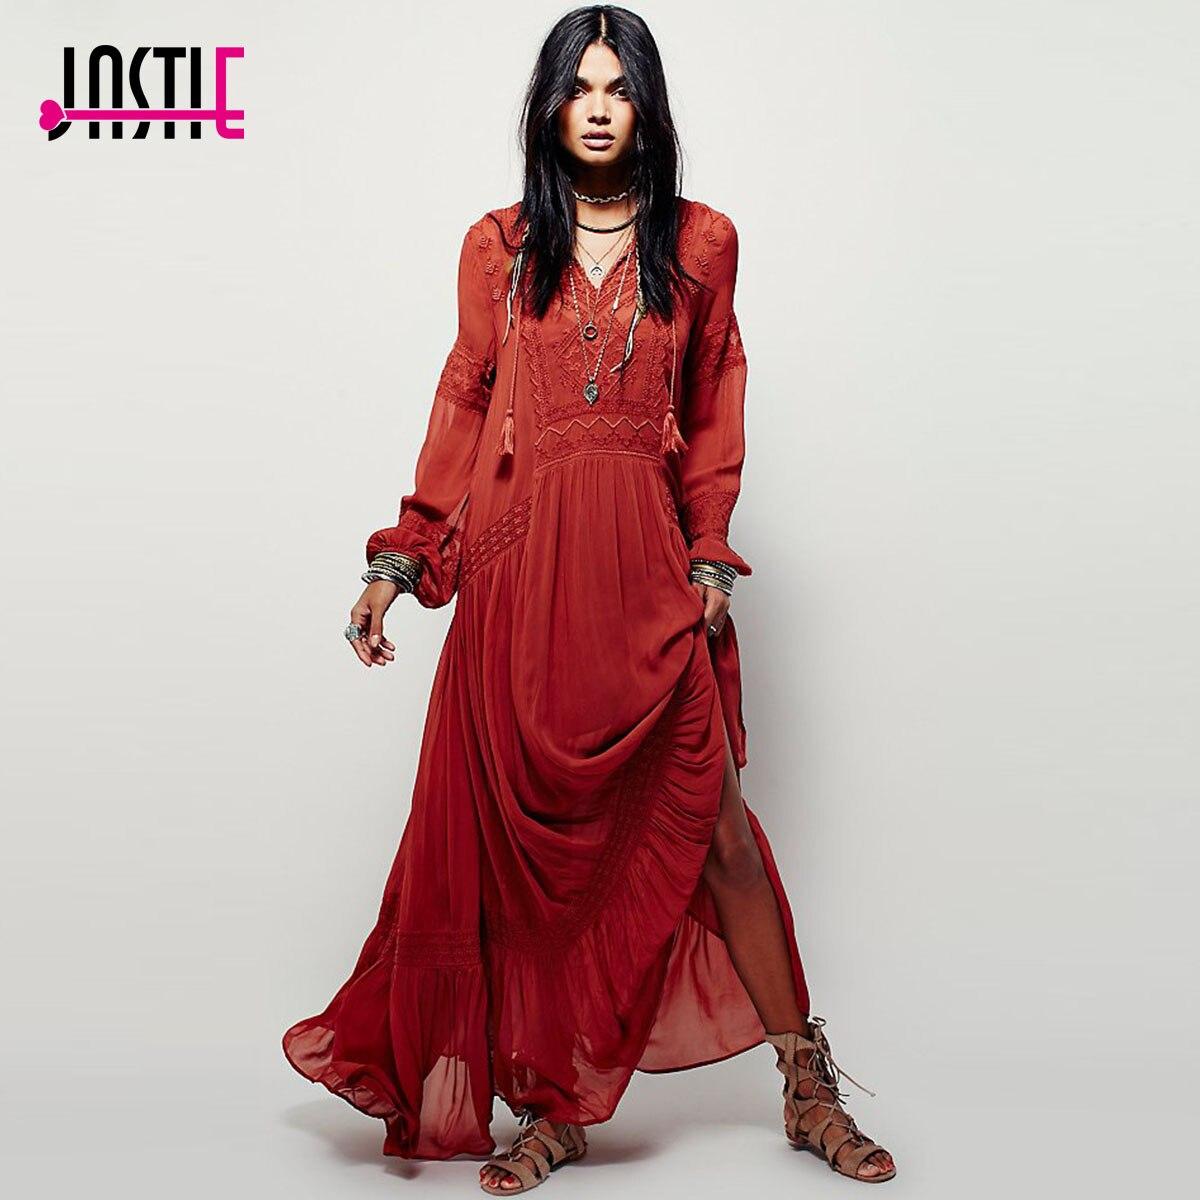 Jastie Embroidered Boho Maxi Dress J5207